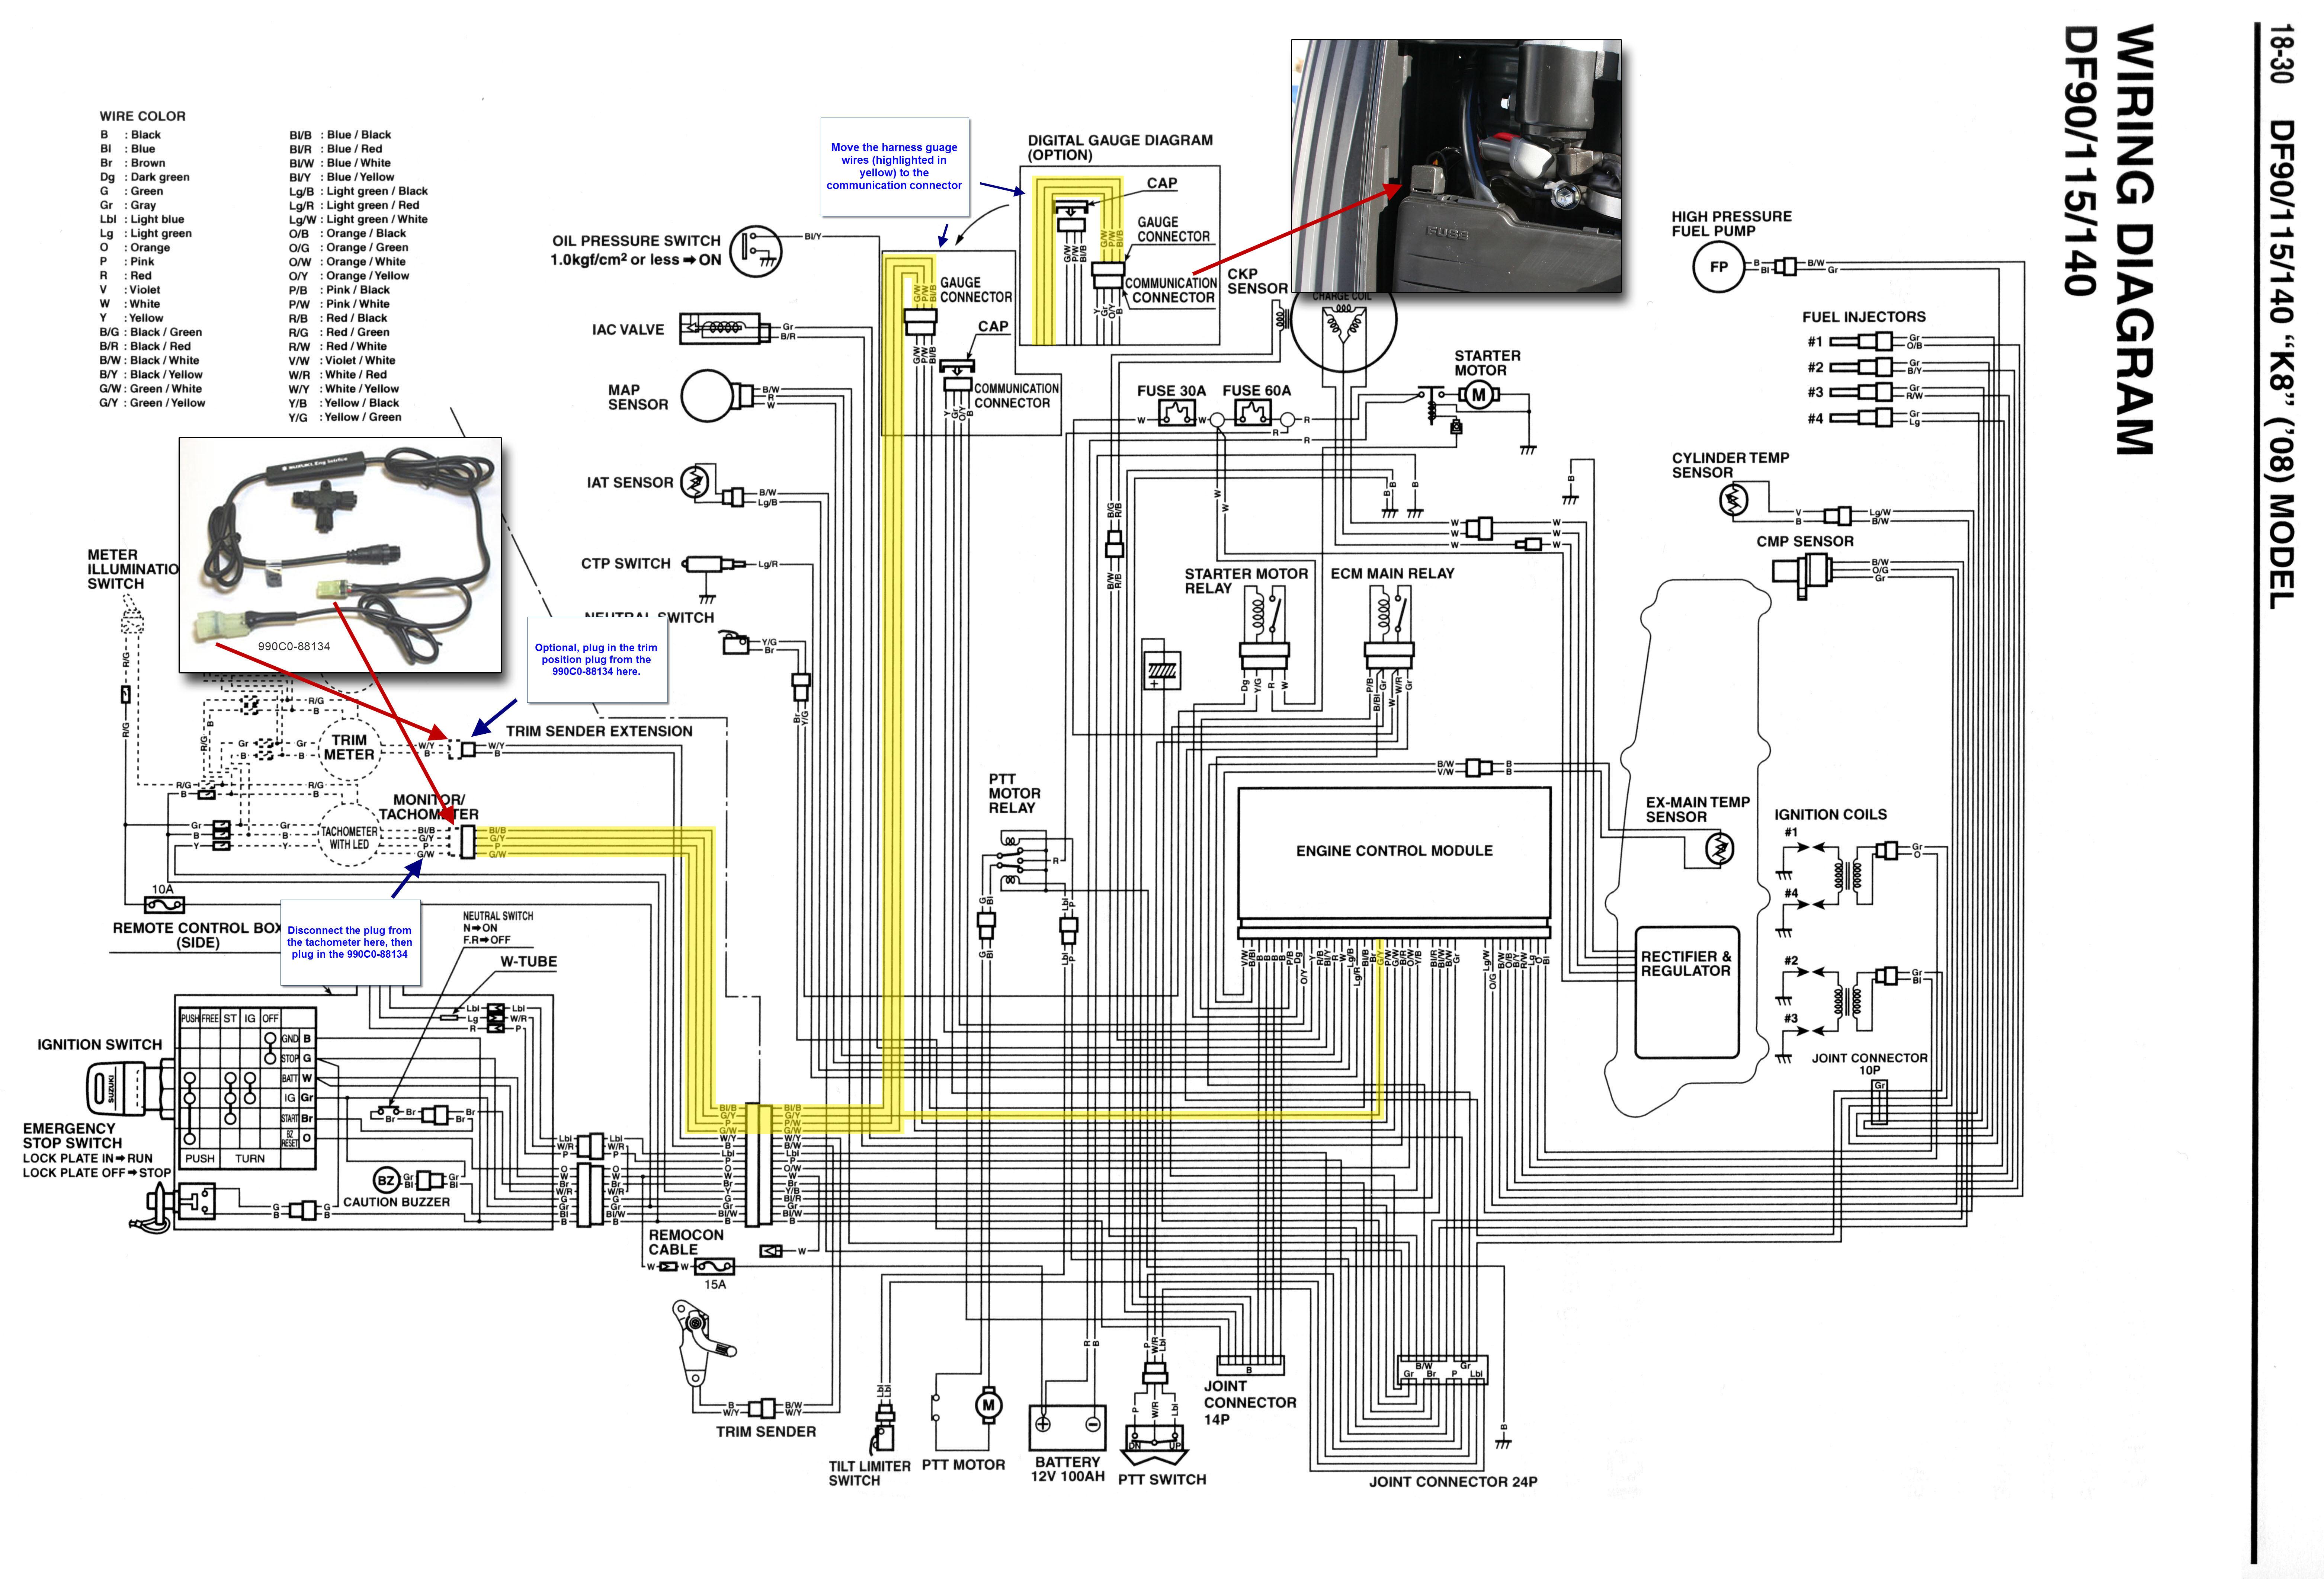 Contemporary Dr350 Suzuki Wiring Diagram Pictures - Diagram Wiring ...